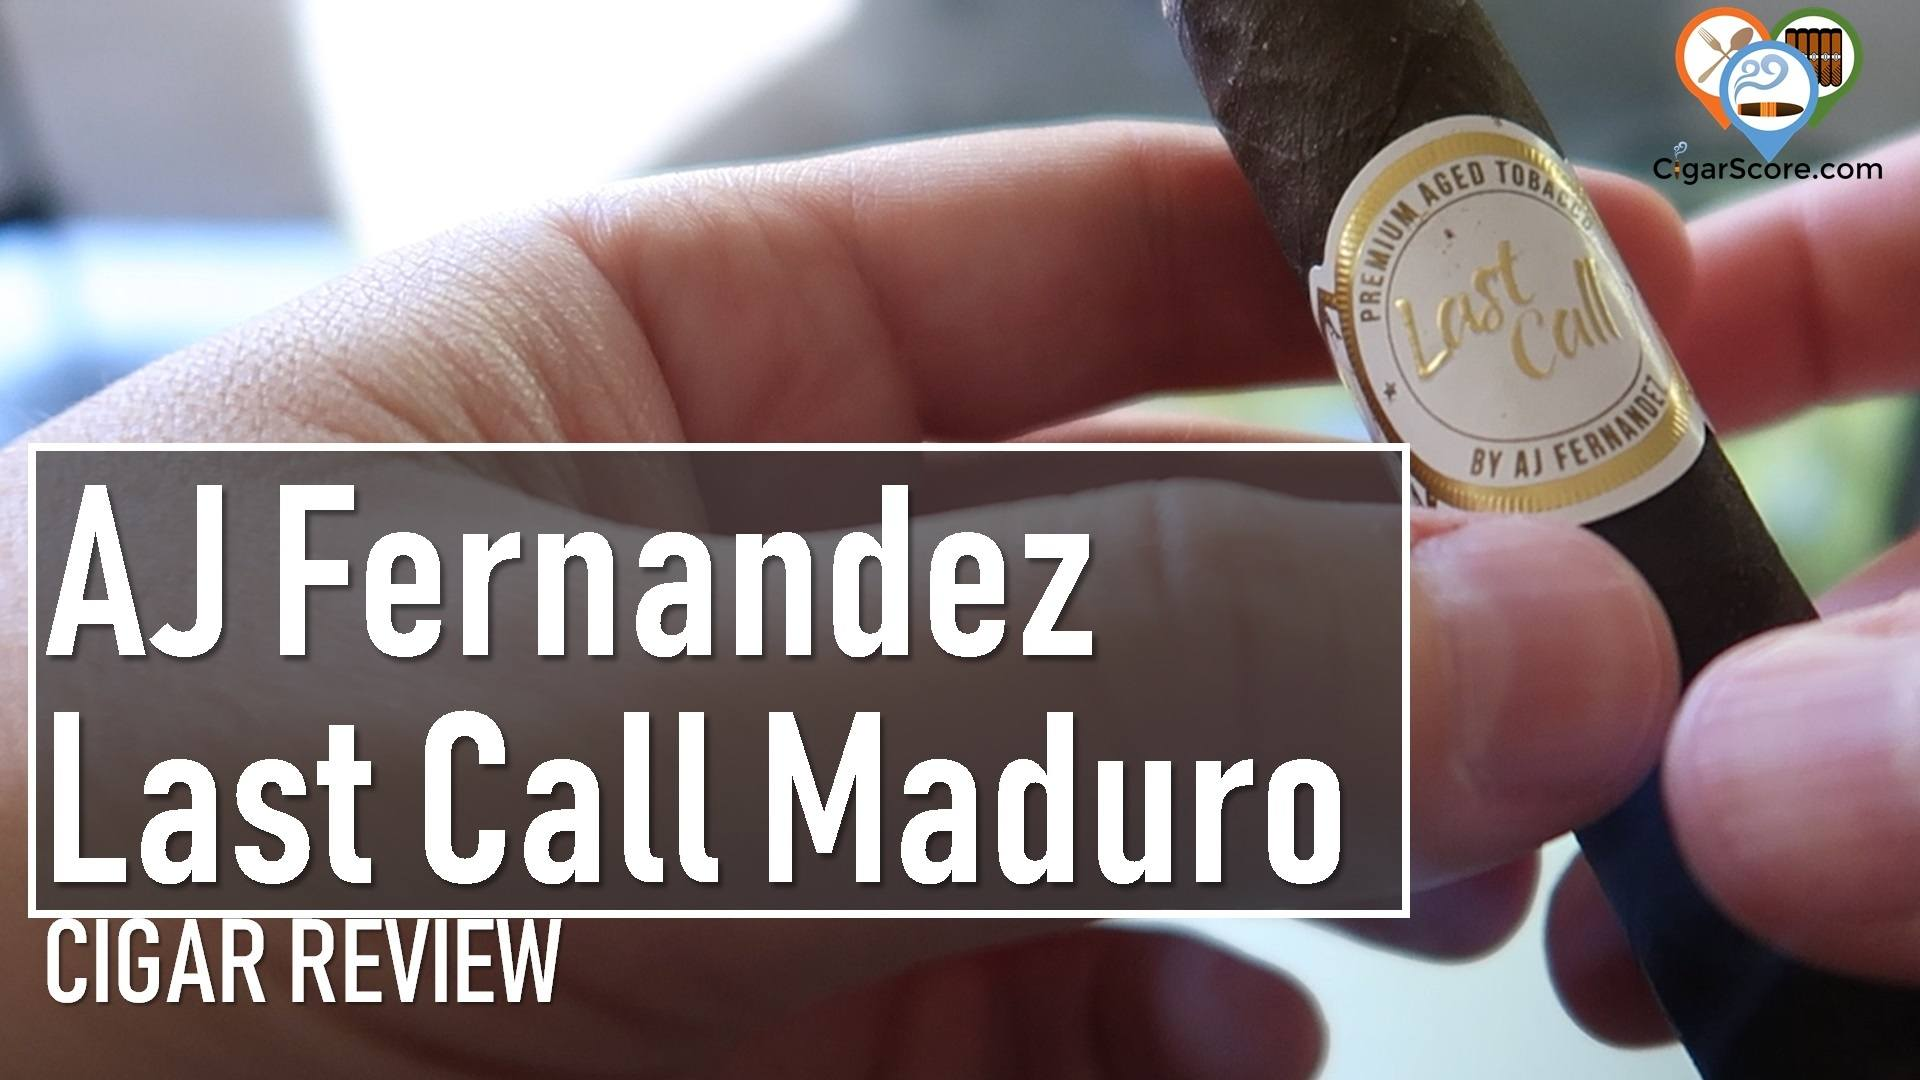 cigar review AJ Fernandez Last Call Maduro Geniales